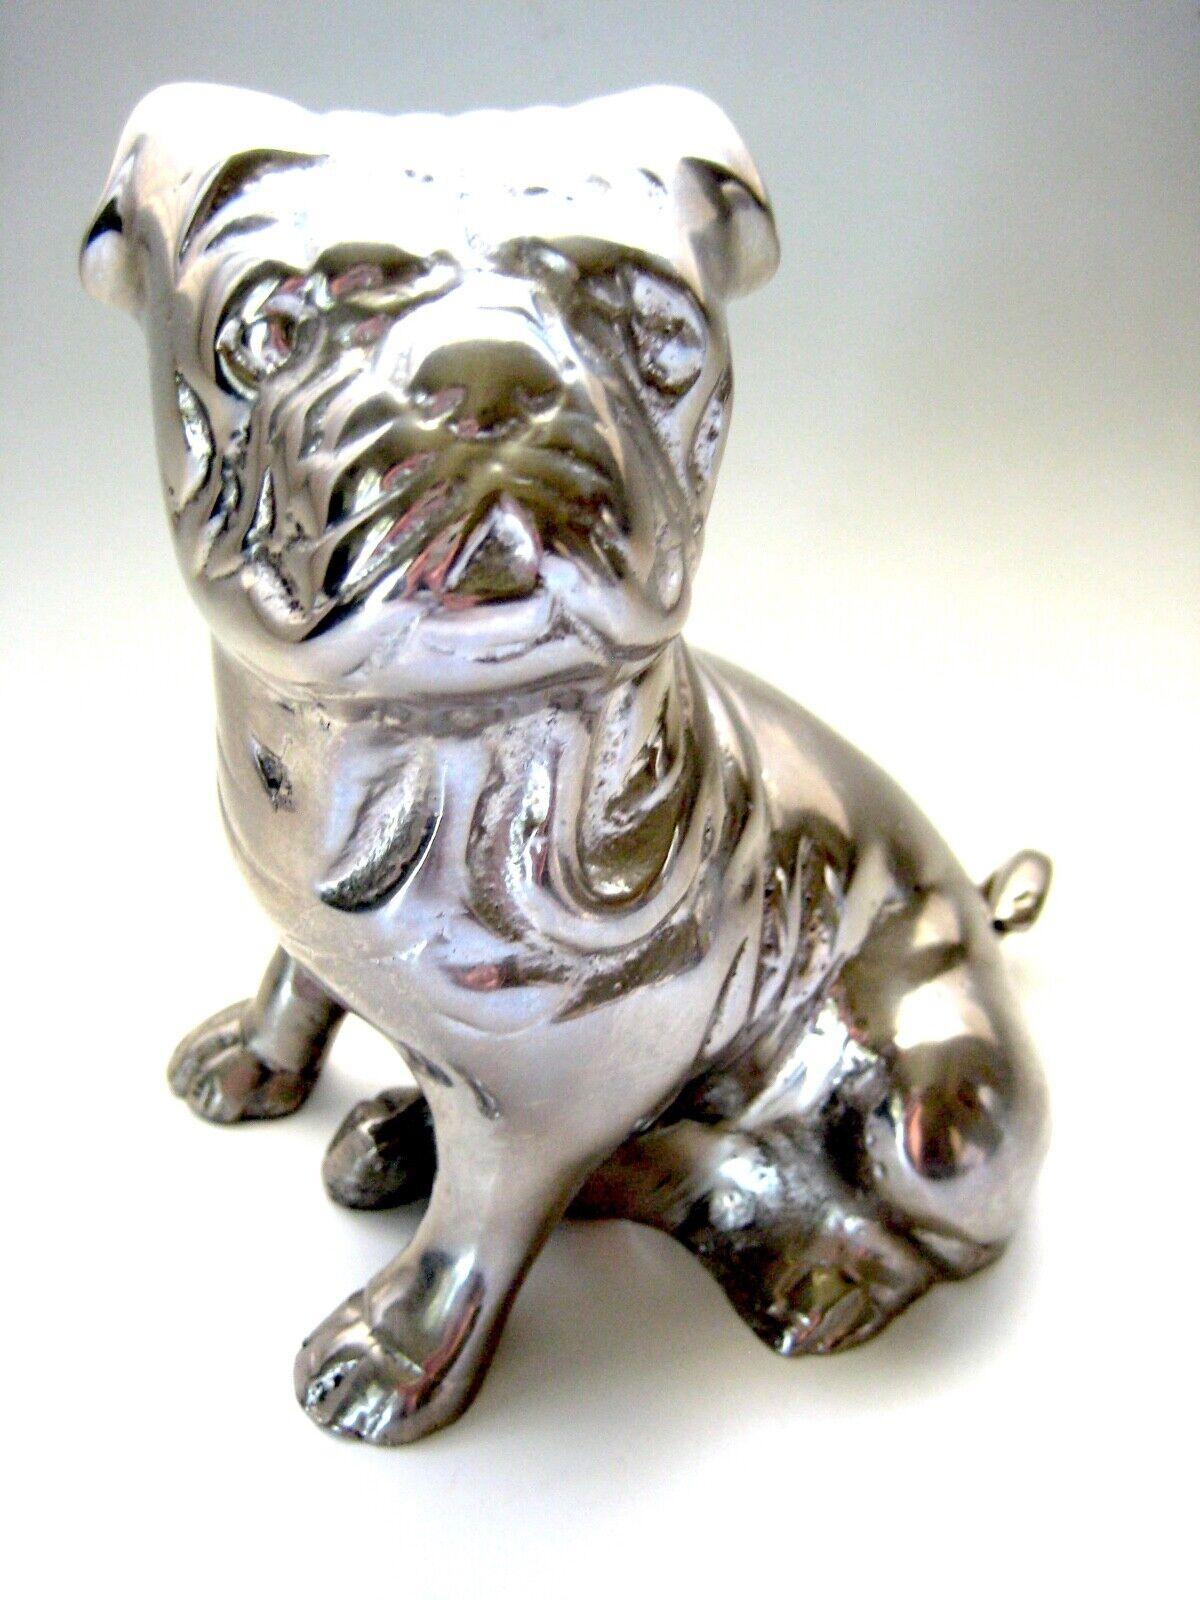 Bulldog Cast Aluminum Sitting Pug Dog Puppy 5 Figurine Shiny Mirrored Ebay